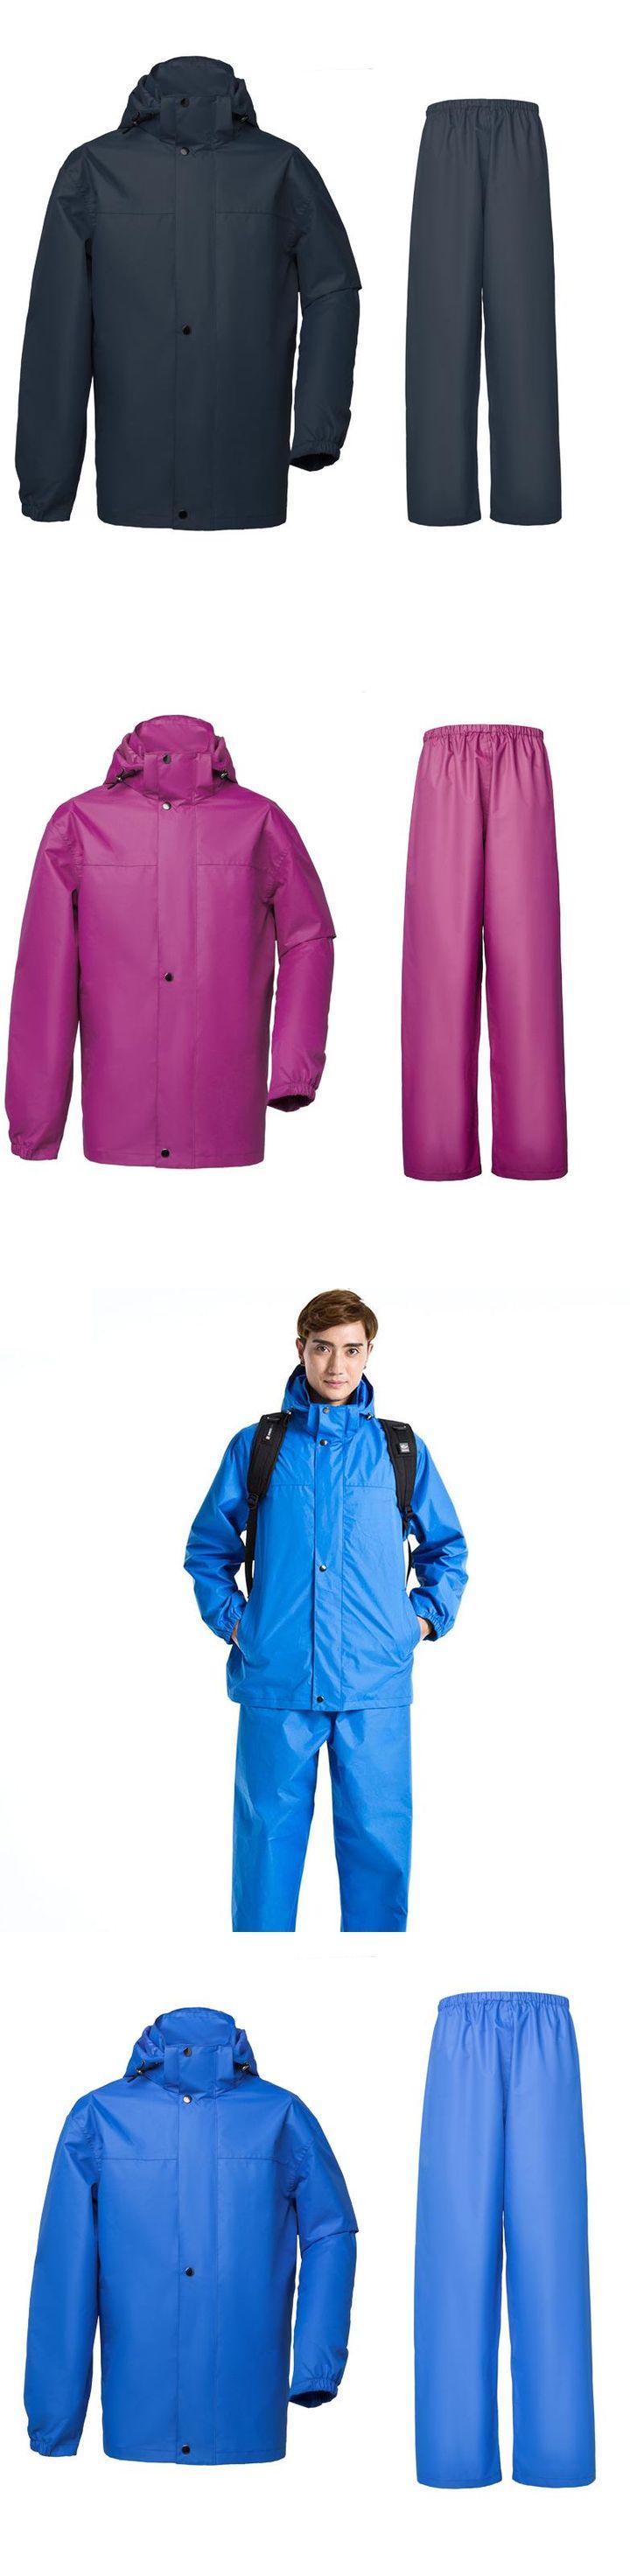 Yuding Oxford Raincoat Rain Pants Heavy Rain Gear Waterproof Motorcycle Bicycle Rain Jacket Suit Fishing Raincoat